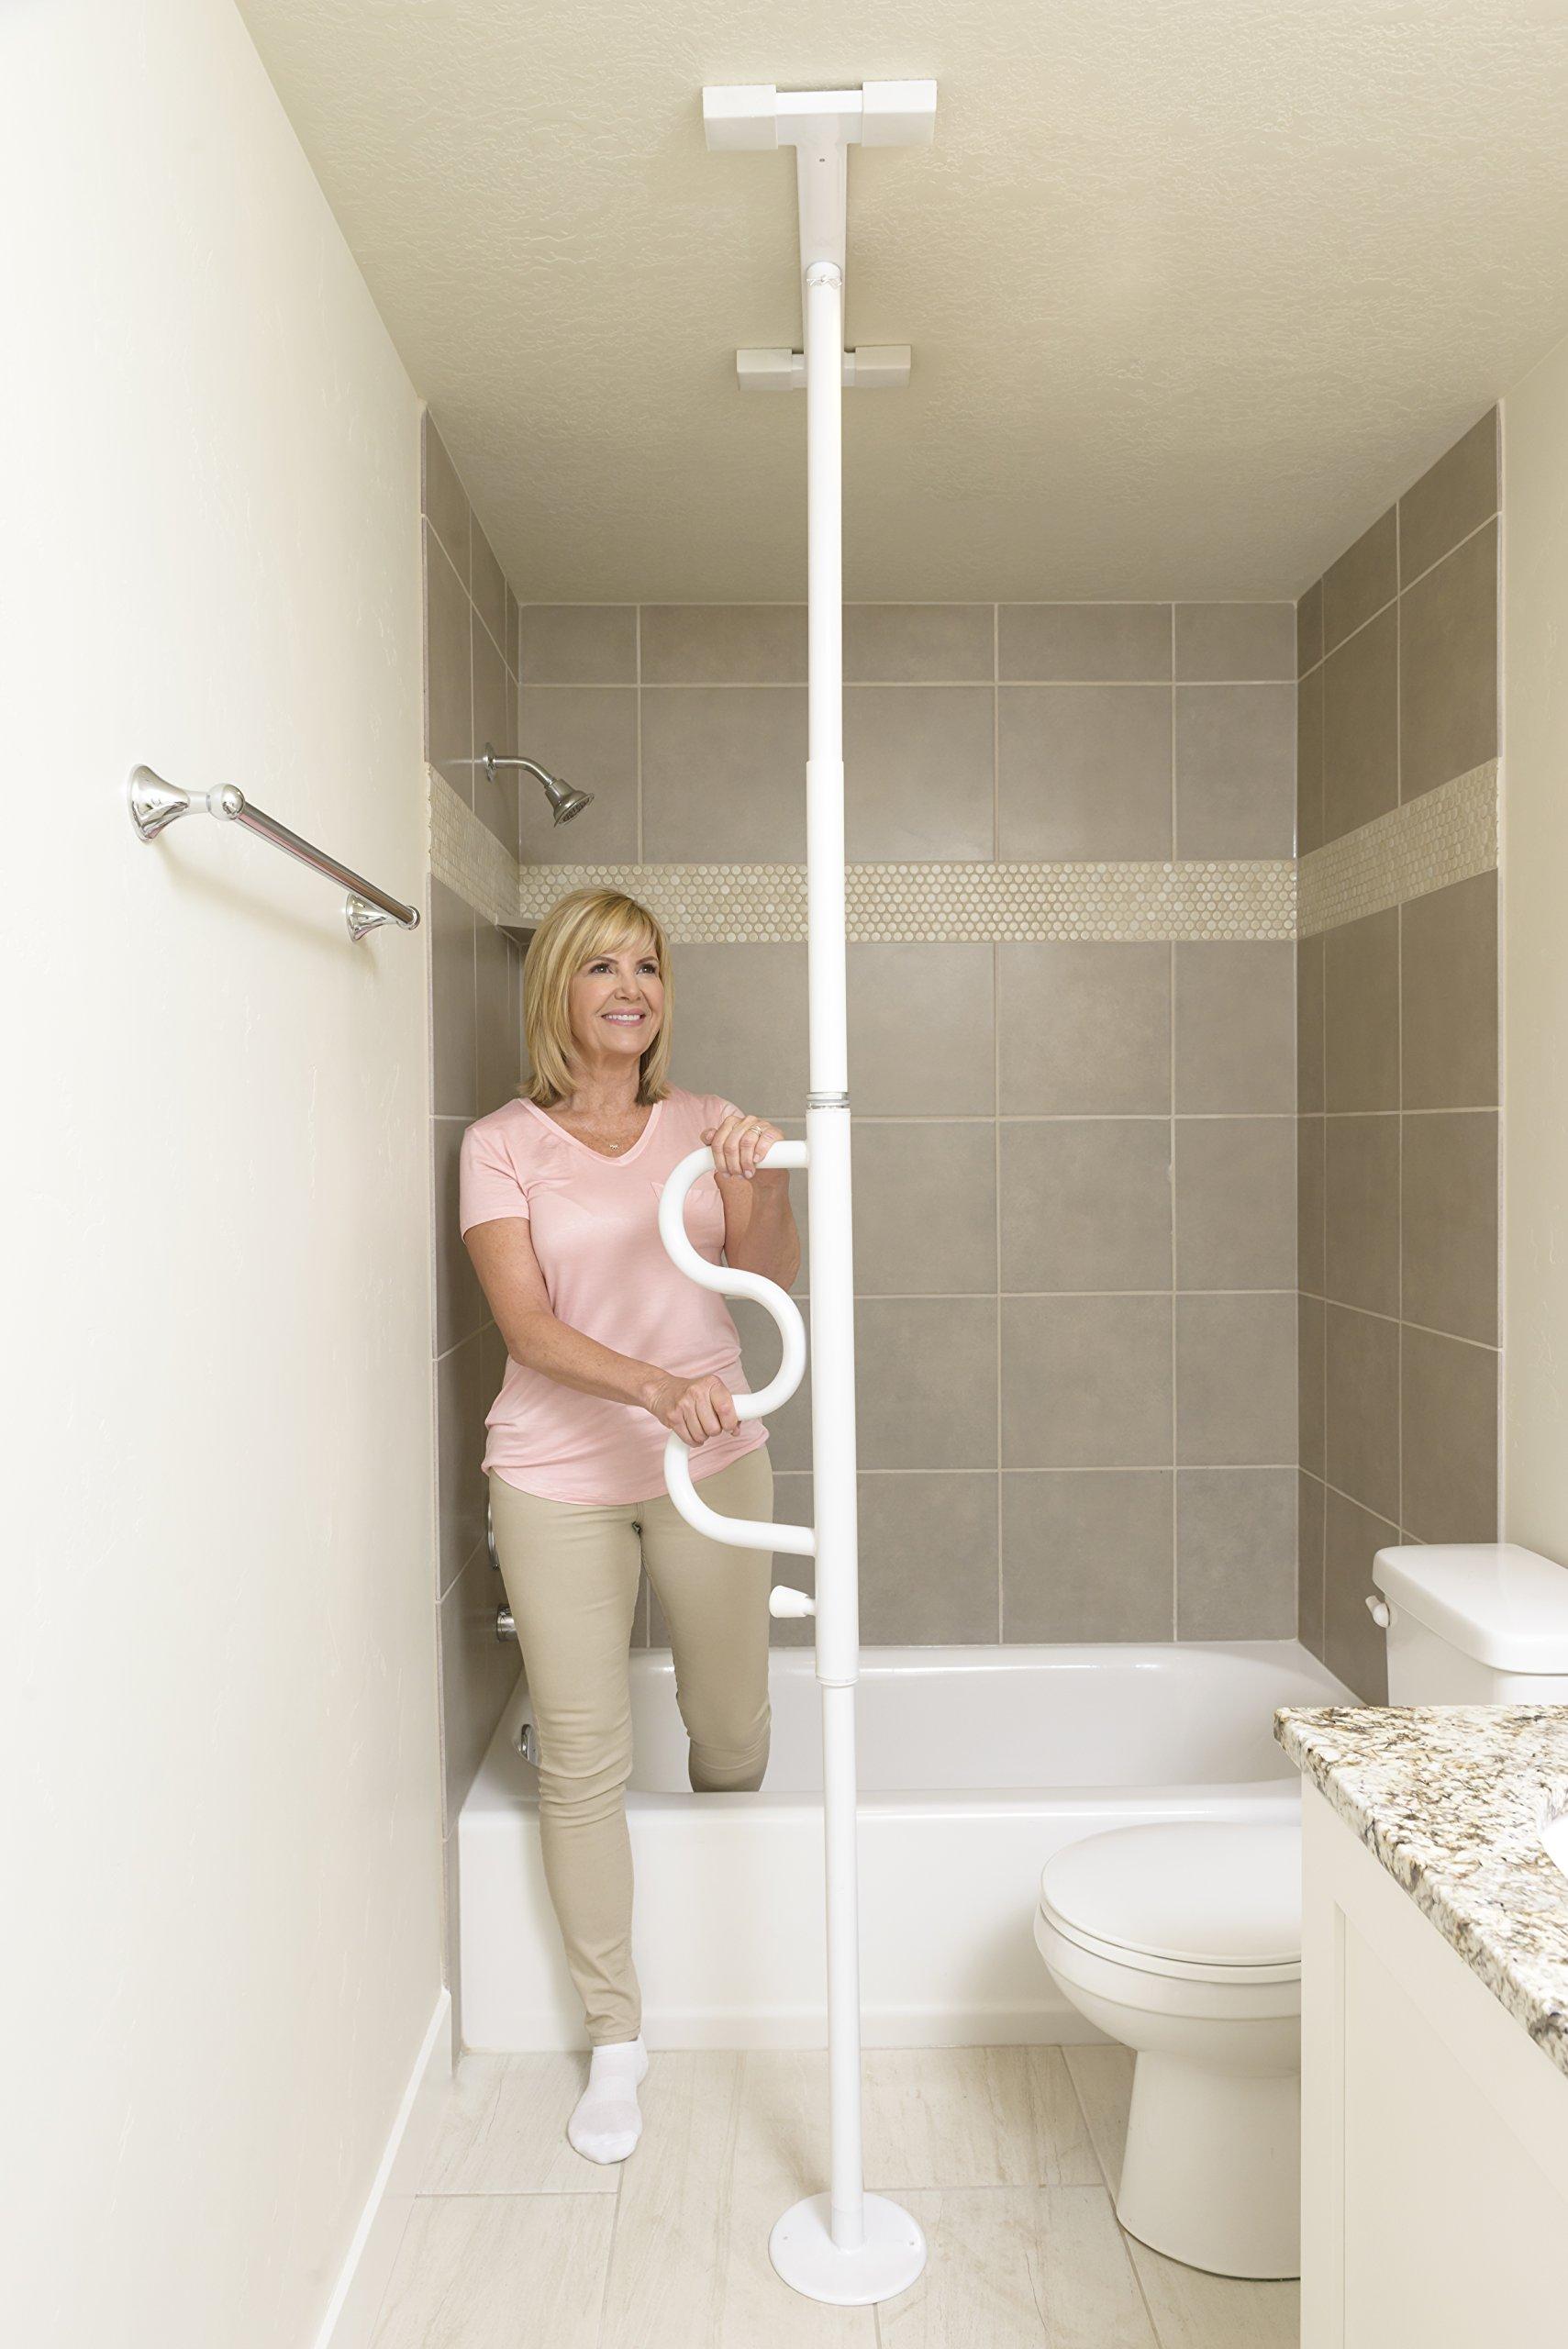 Stander Security Pole & Curve Grab Bar - Elderly Tension Mounted Transfer Pole + Bathroom Assist Grab Bar - Iceberg White by Stander (Image #3)